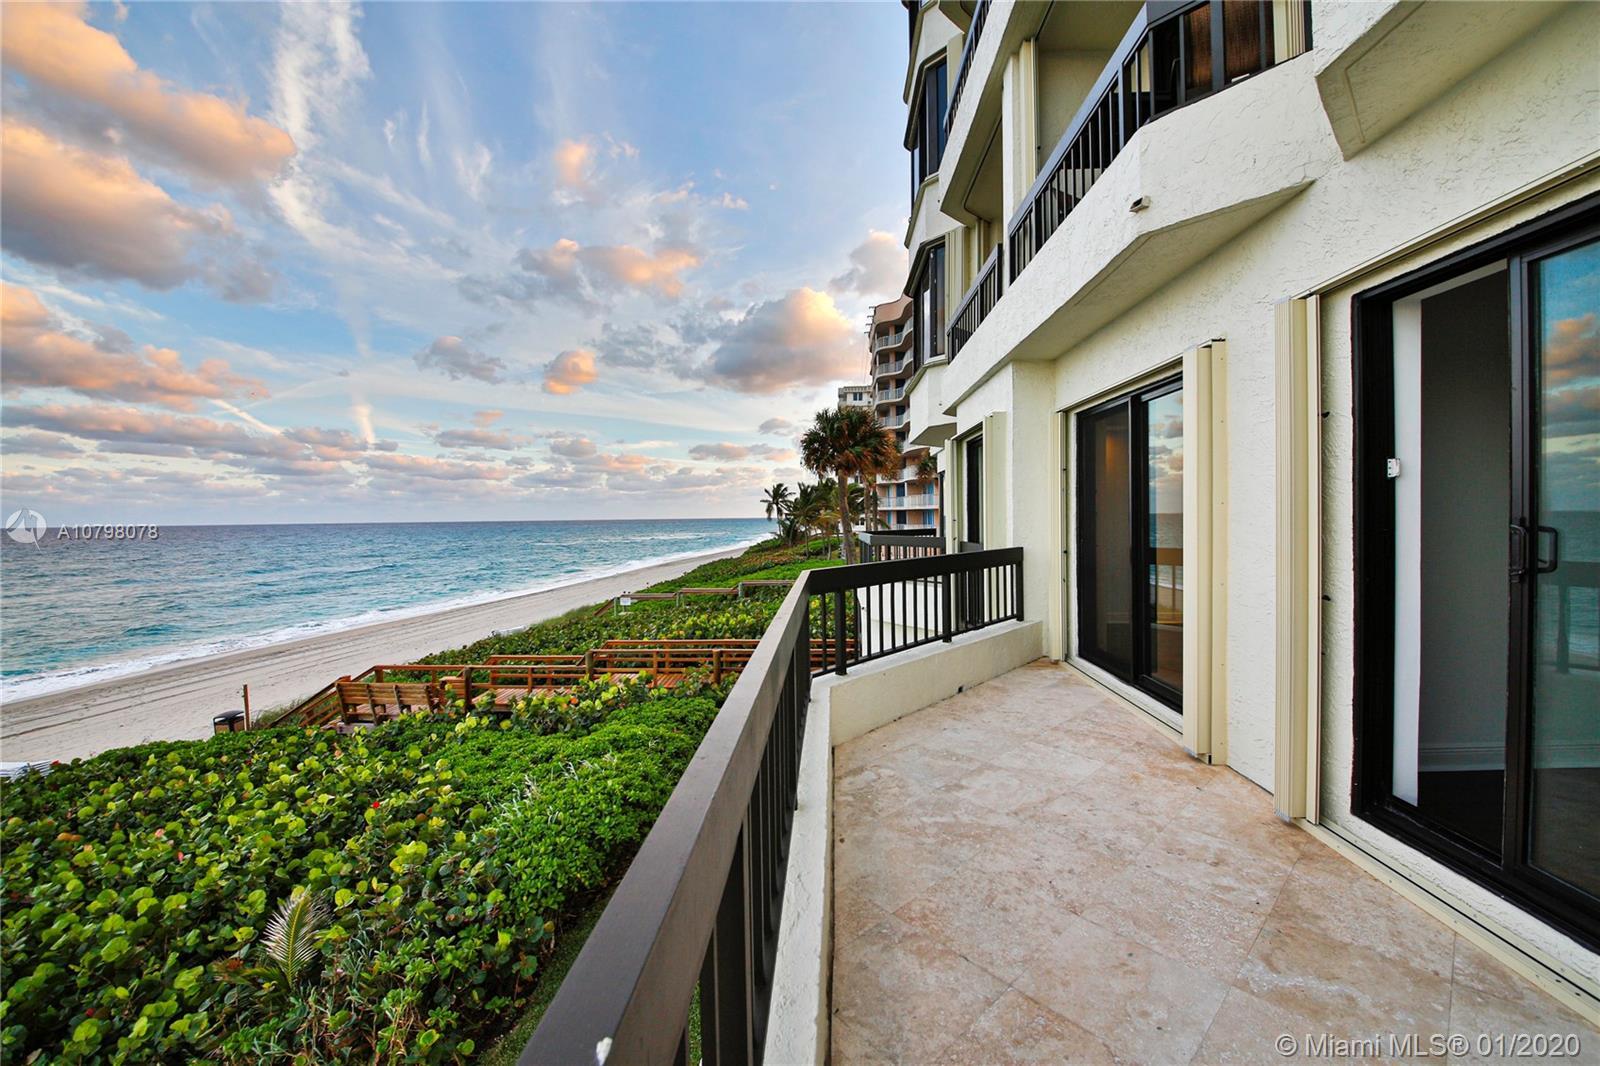 image #1 of property, Beach Walk Condo, Unit 101